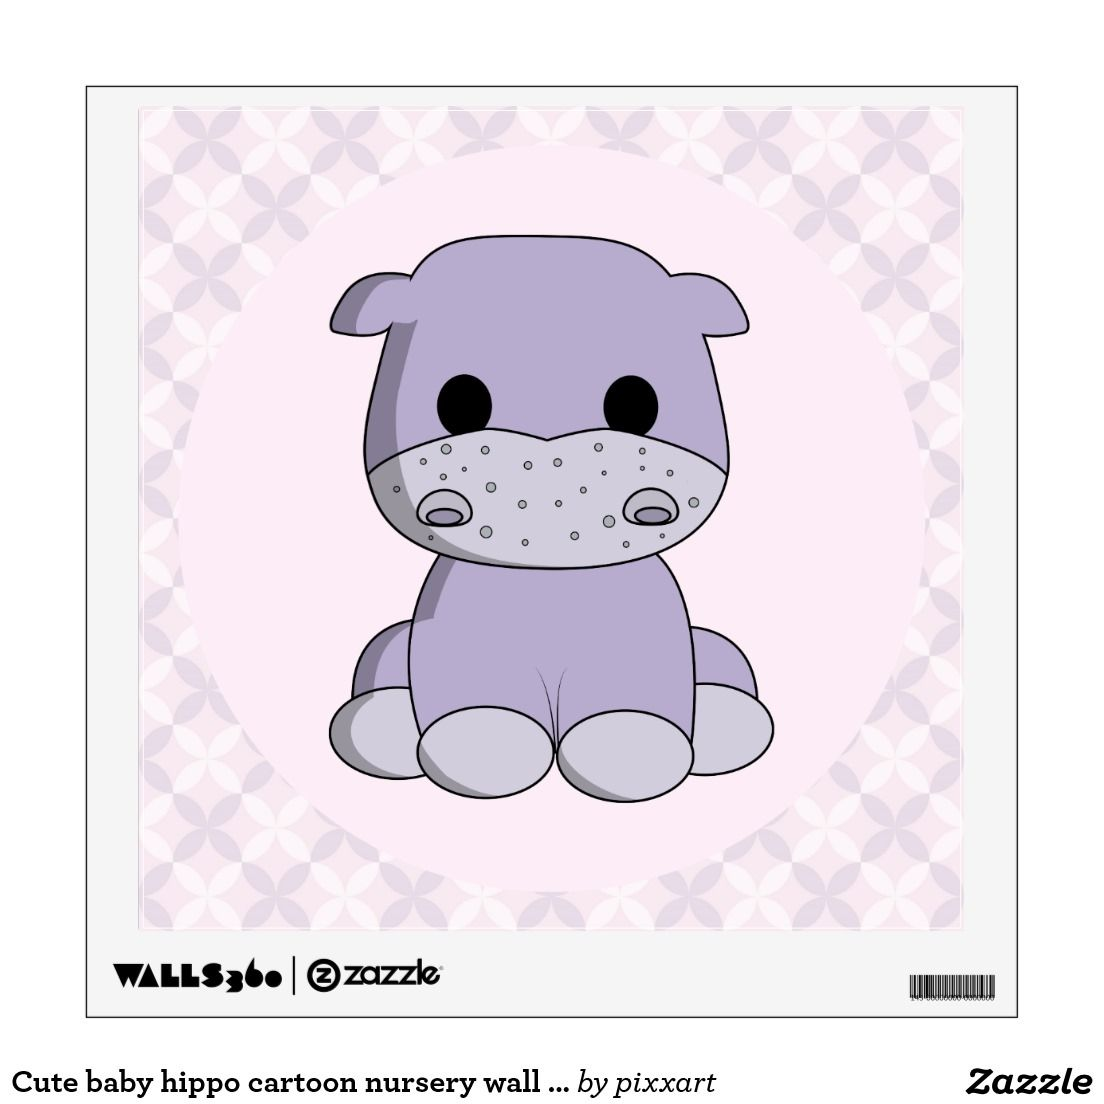 Cute baby hippo cartoon nursery wall decal Nursery wall